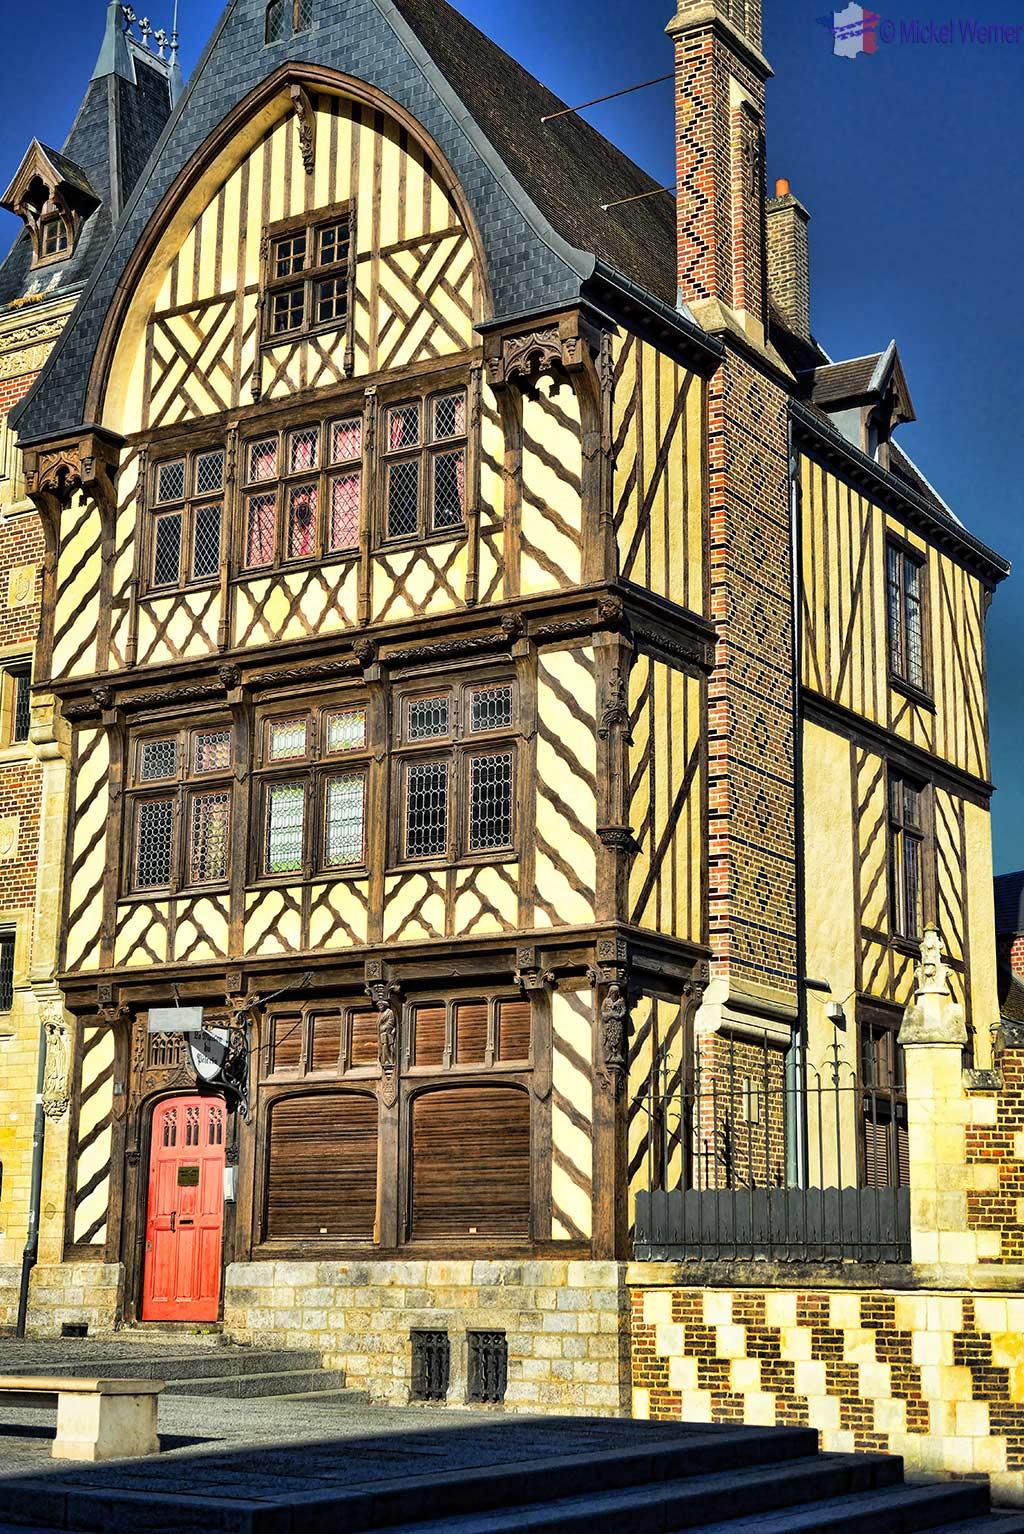 The Maison du Pelerin of Amiens